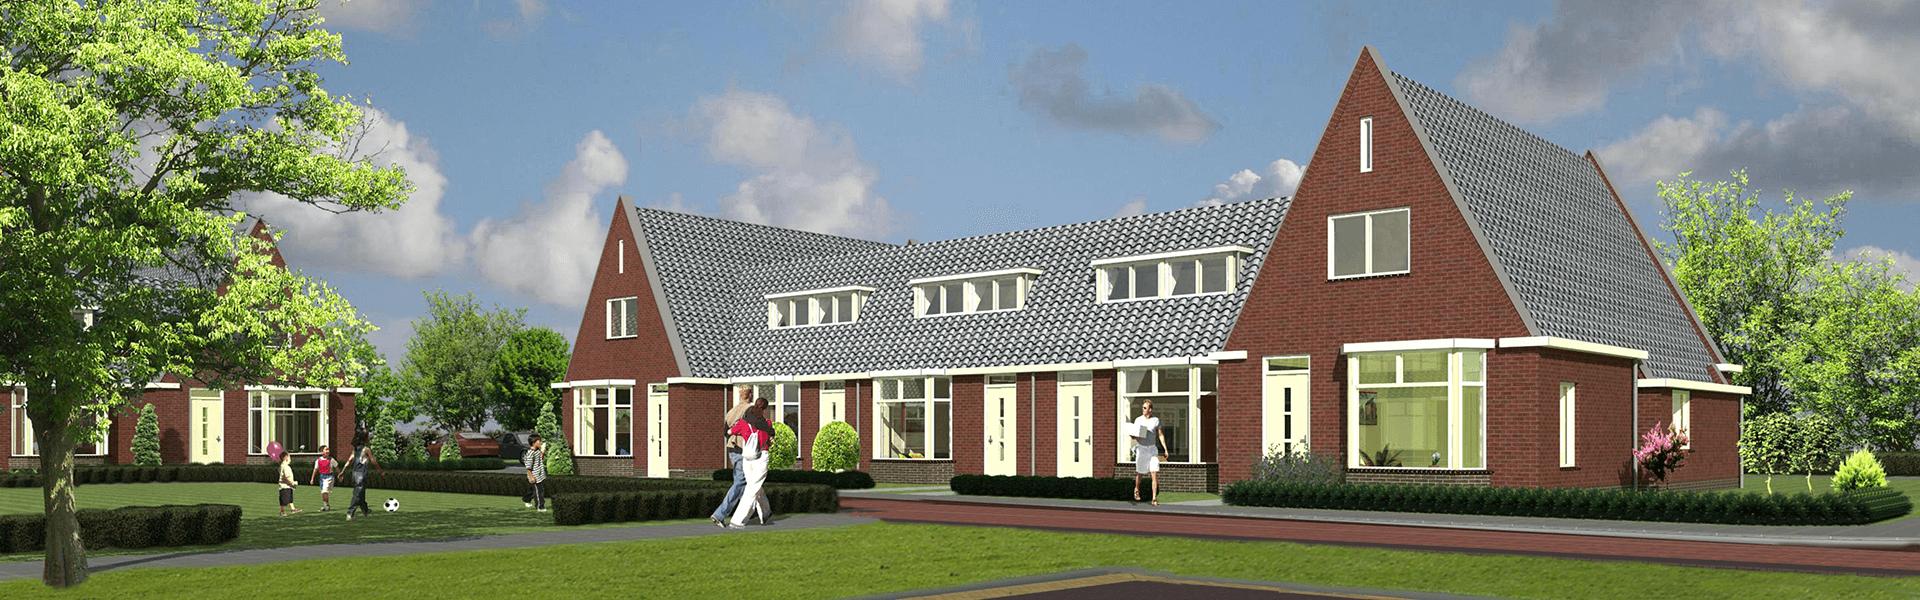 Woningbouw - Bouwbedrijf Heeringa